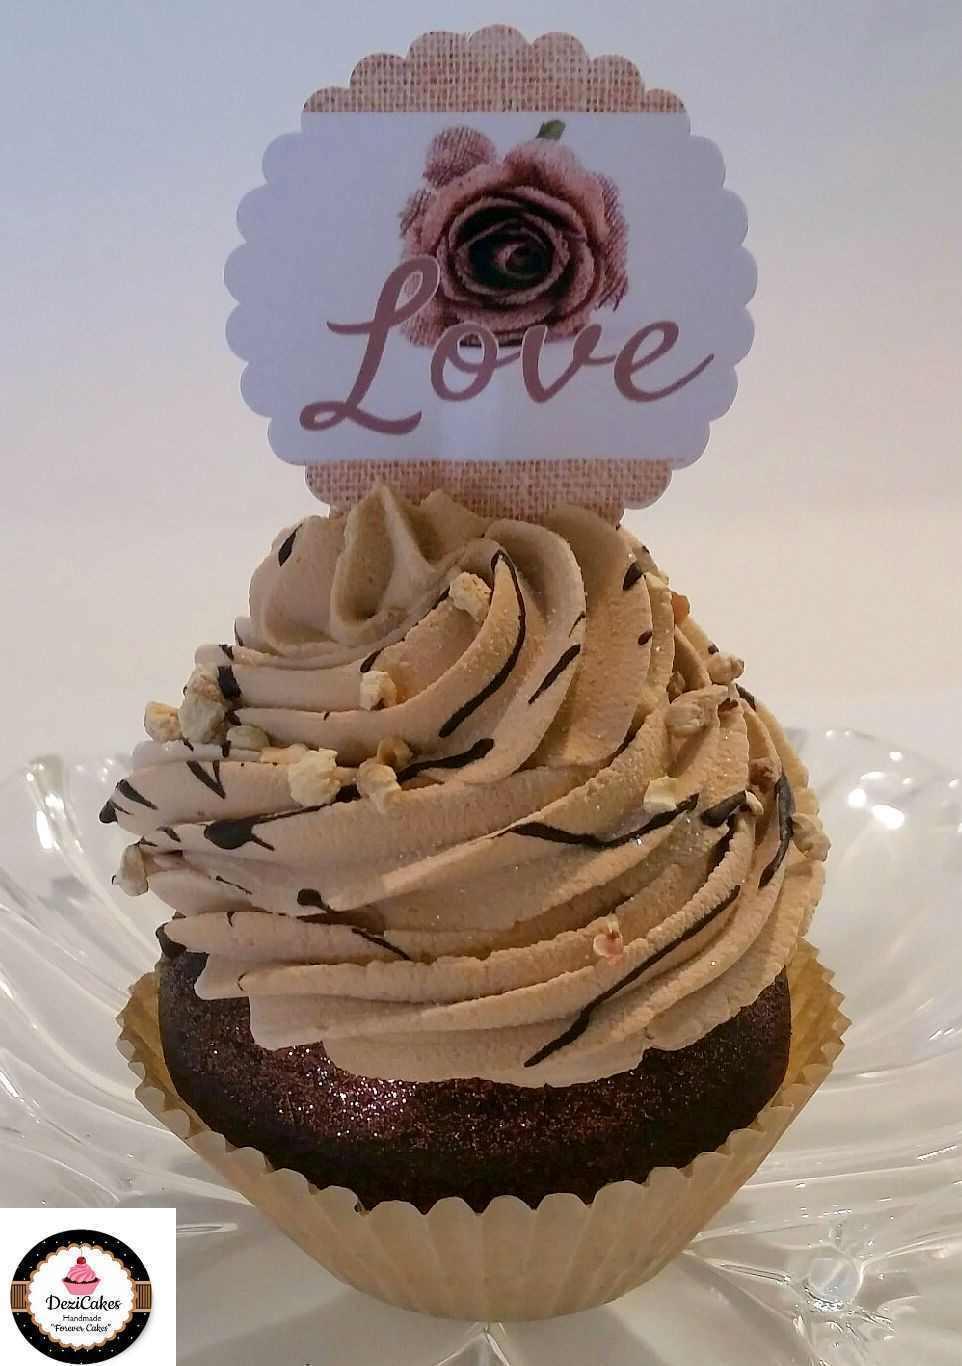 Miraculous Fake Cake Chocolate Birthday Cake With Confetti Prop Decoration Personalised Birthday Cards Bromeletsinfo